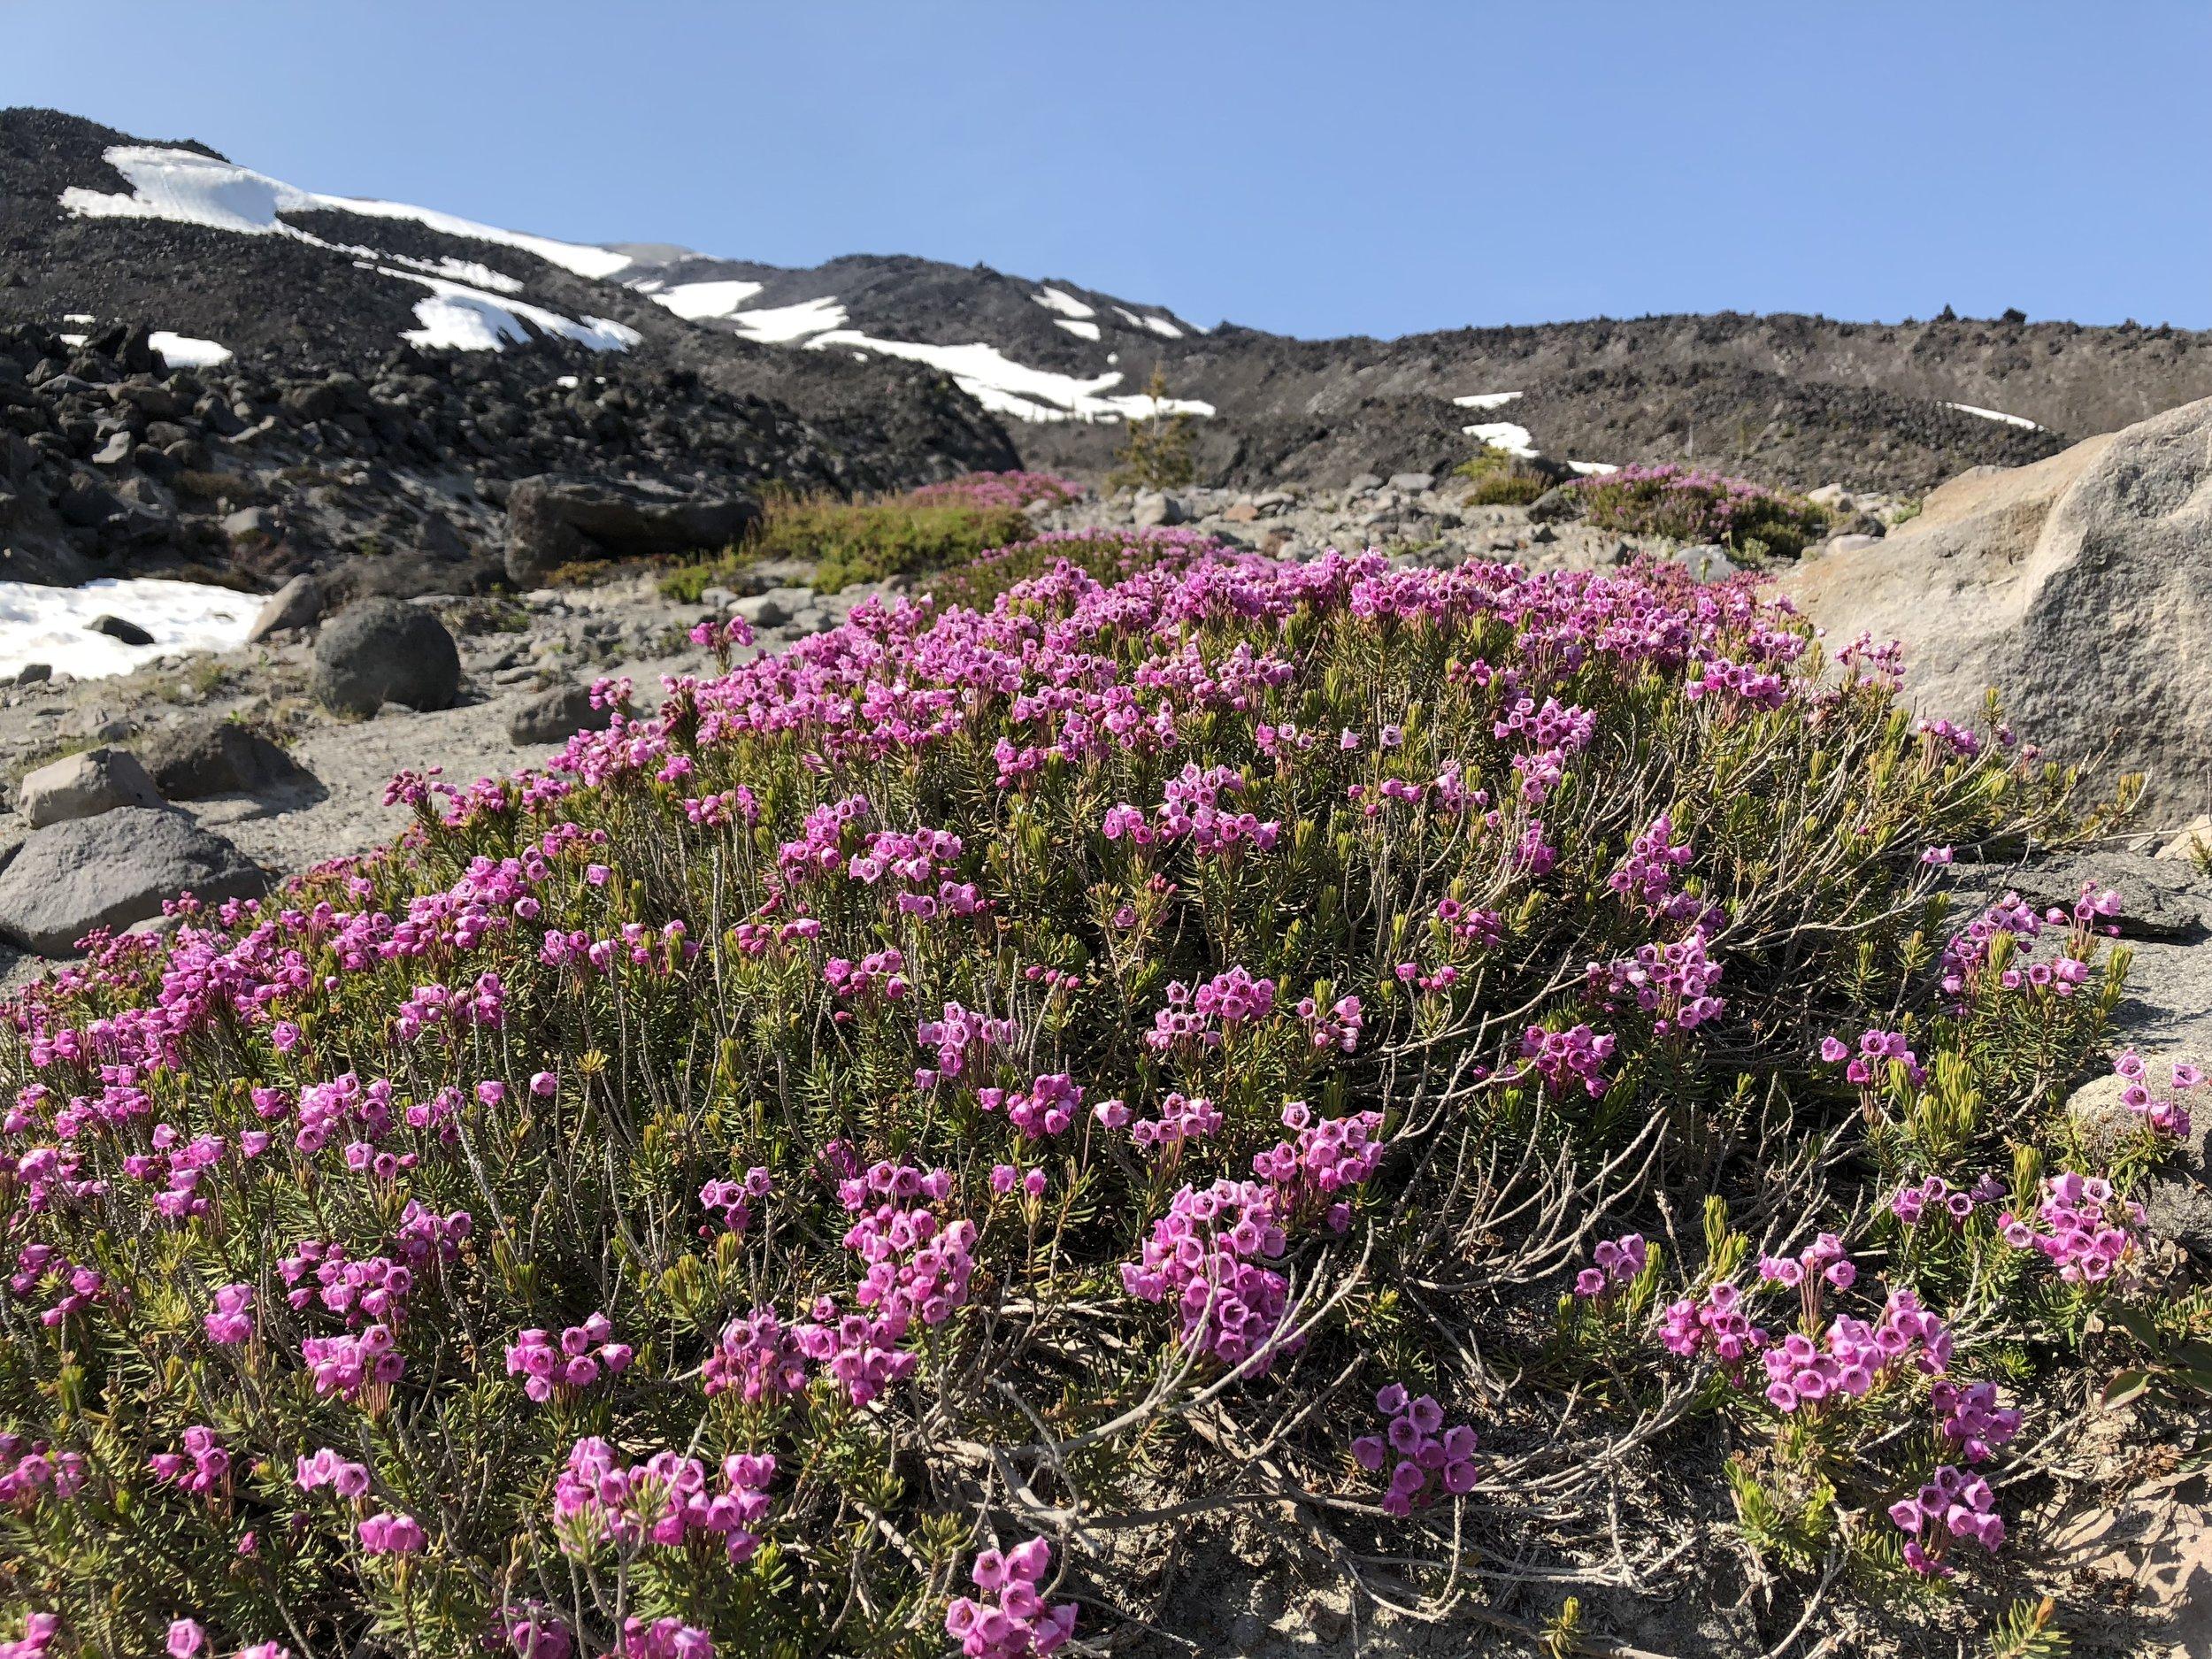 Wildflowers near the treeline looking up the mountain.